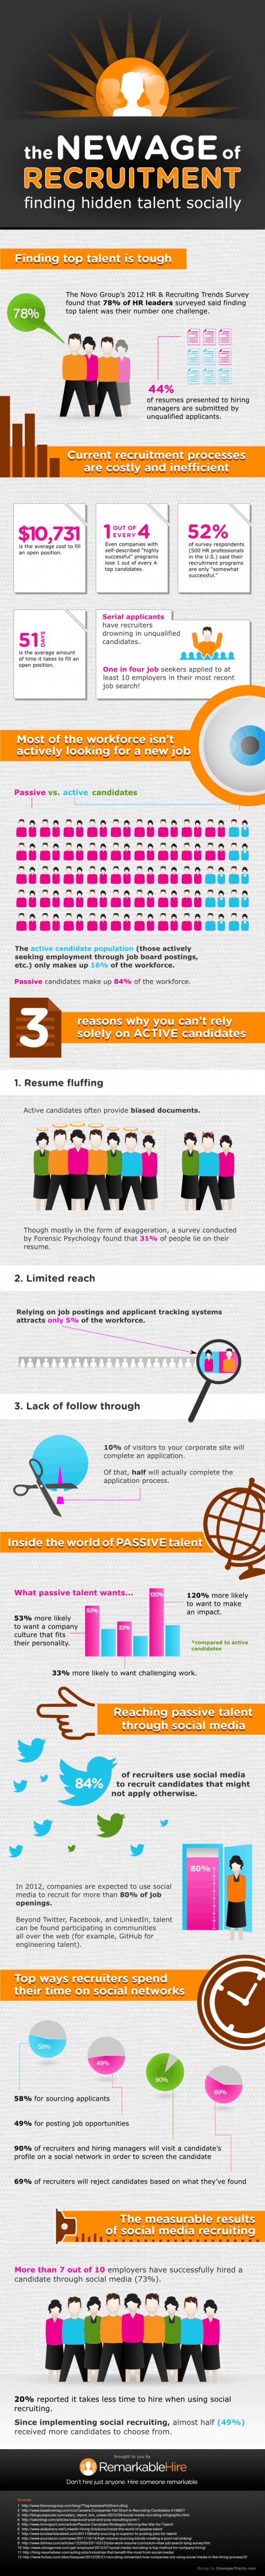 social recruiting finding talent